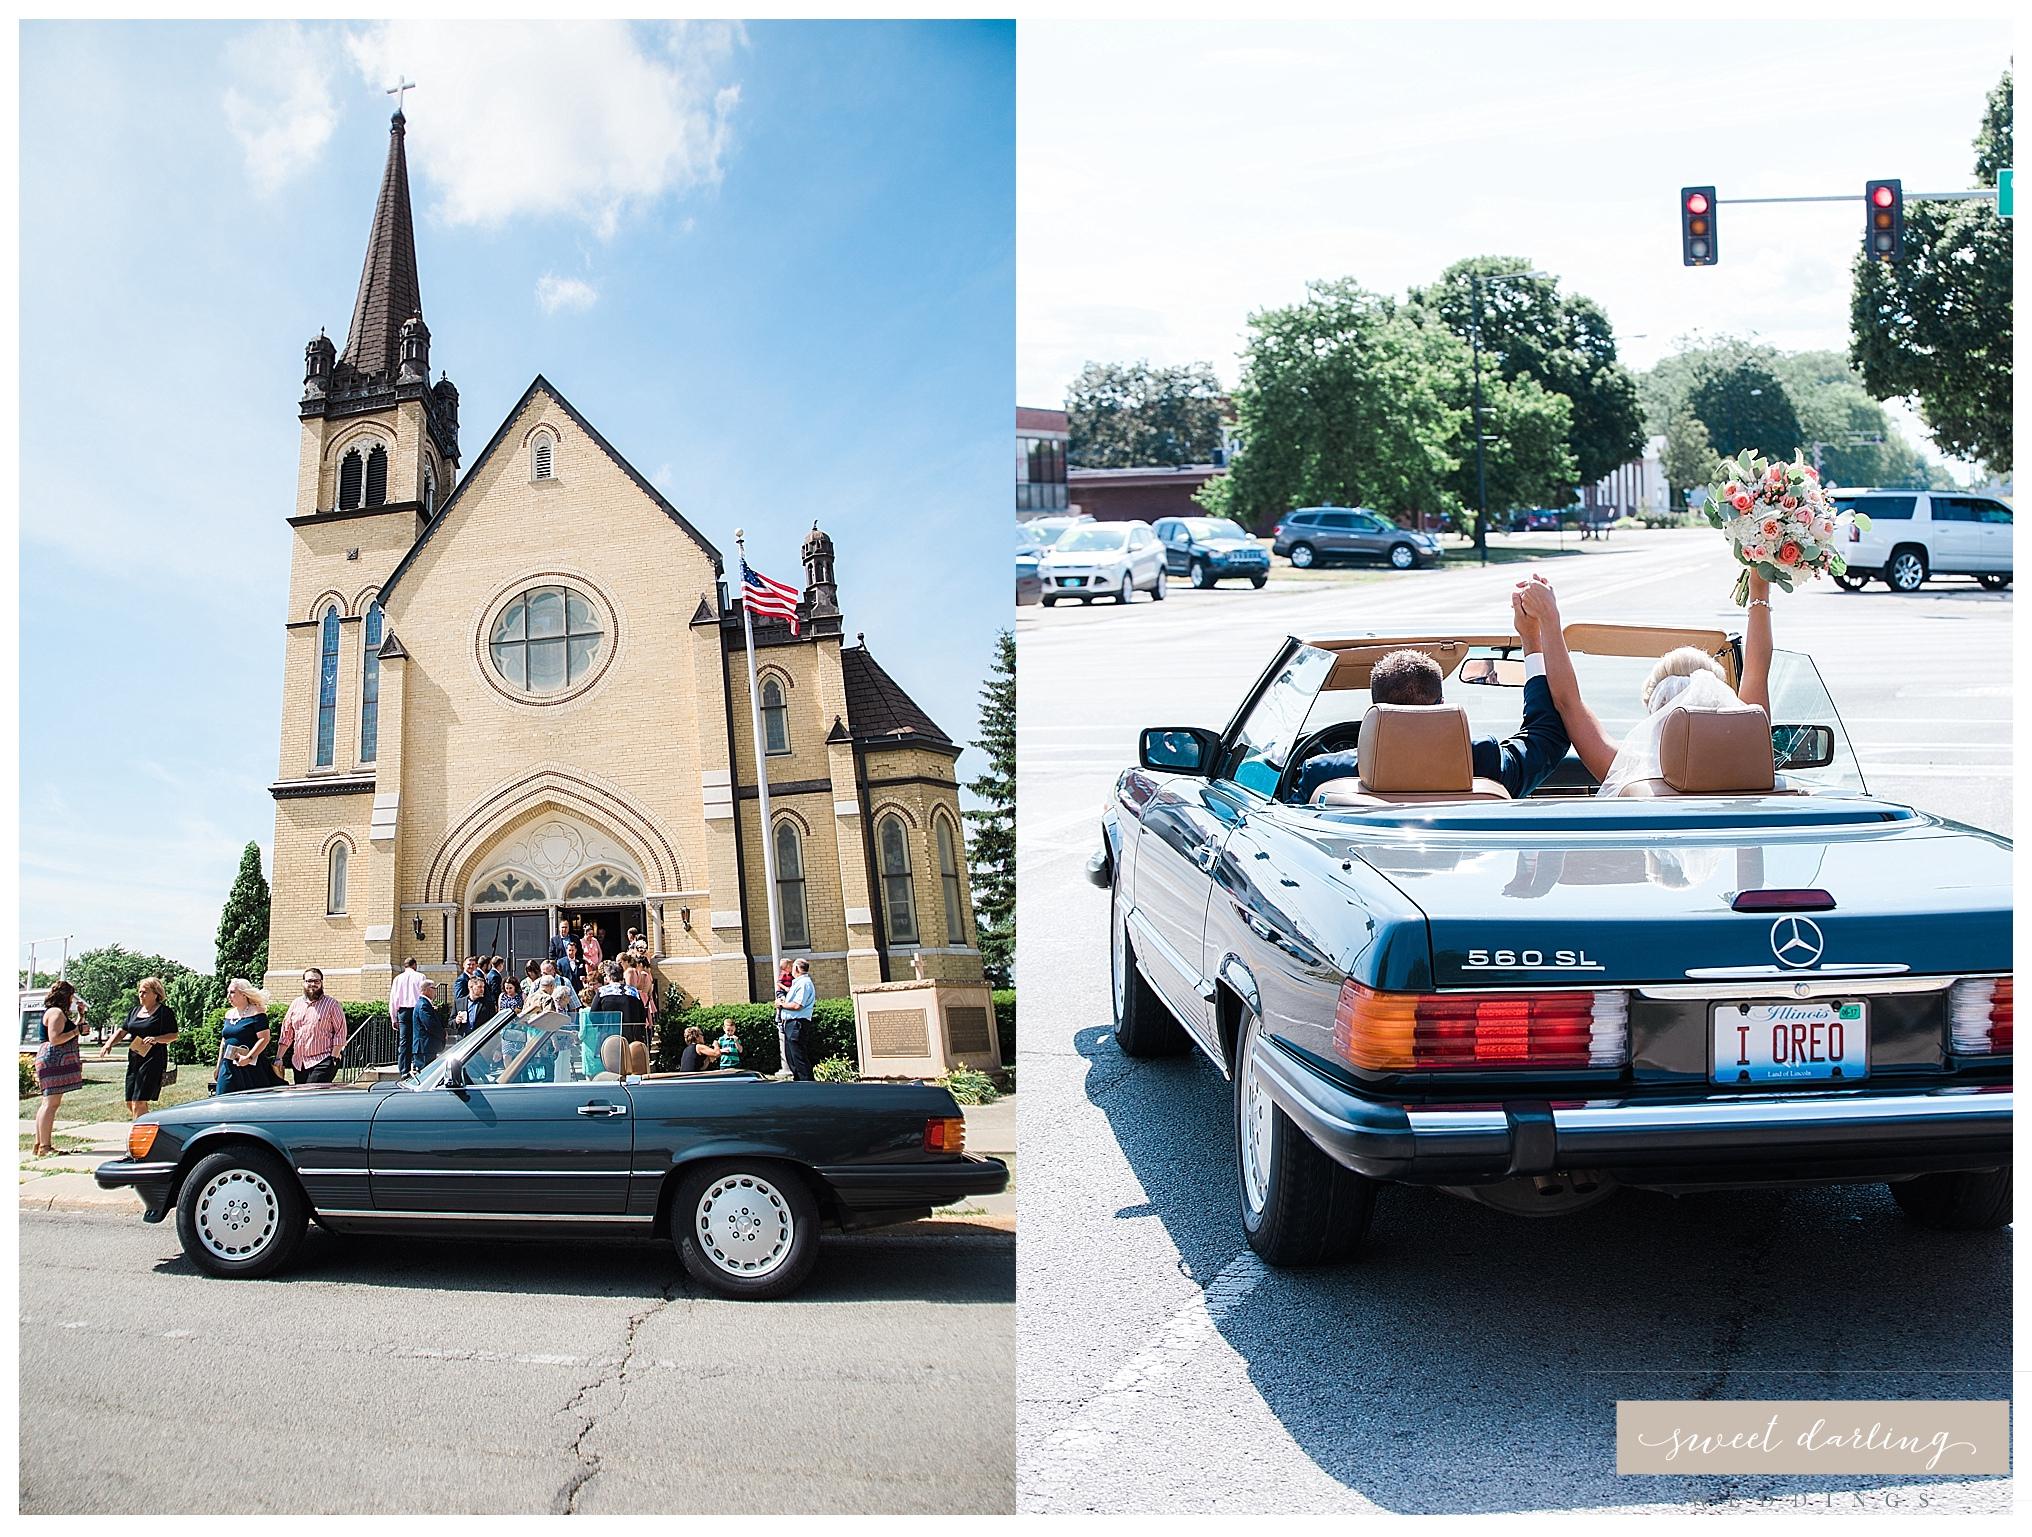 Paxton-illinois-engelbrecht-farmstead-romantic-wedding-photographer-sweet-darling-weddings_1235.jpg